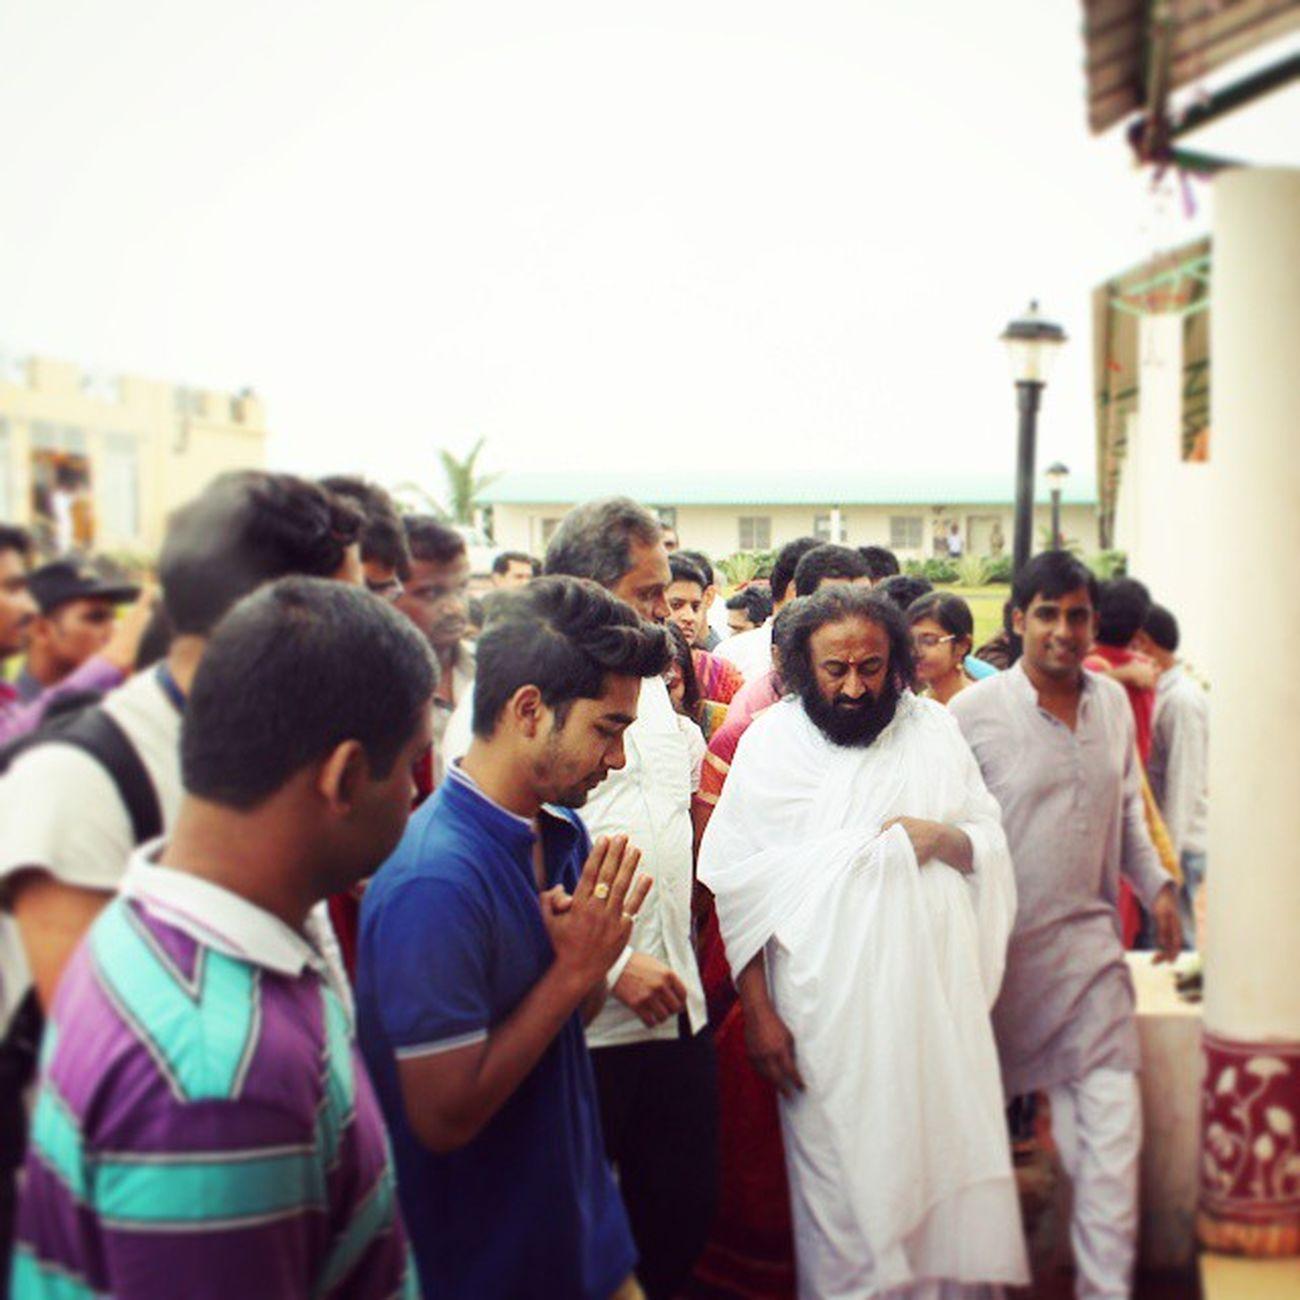 ThankYouSriSri SriSriUniversity SriSriRavisankar Guruji blessed